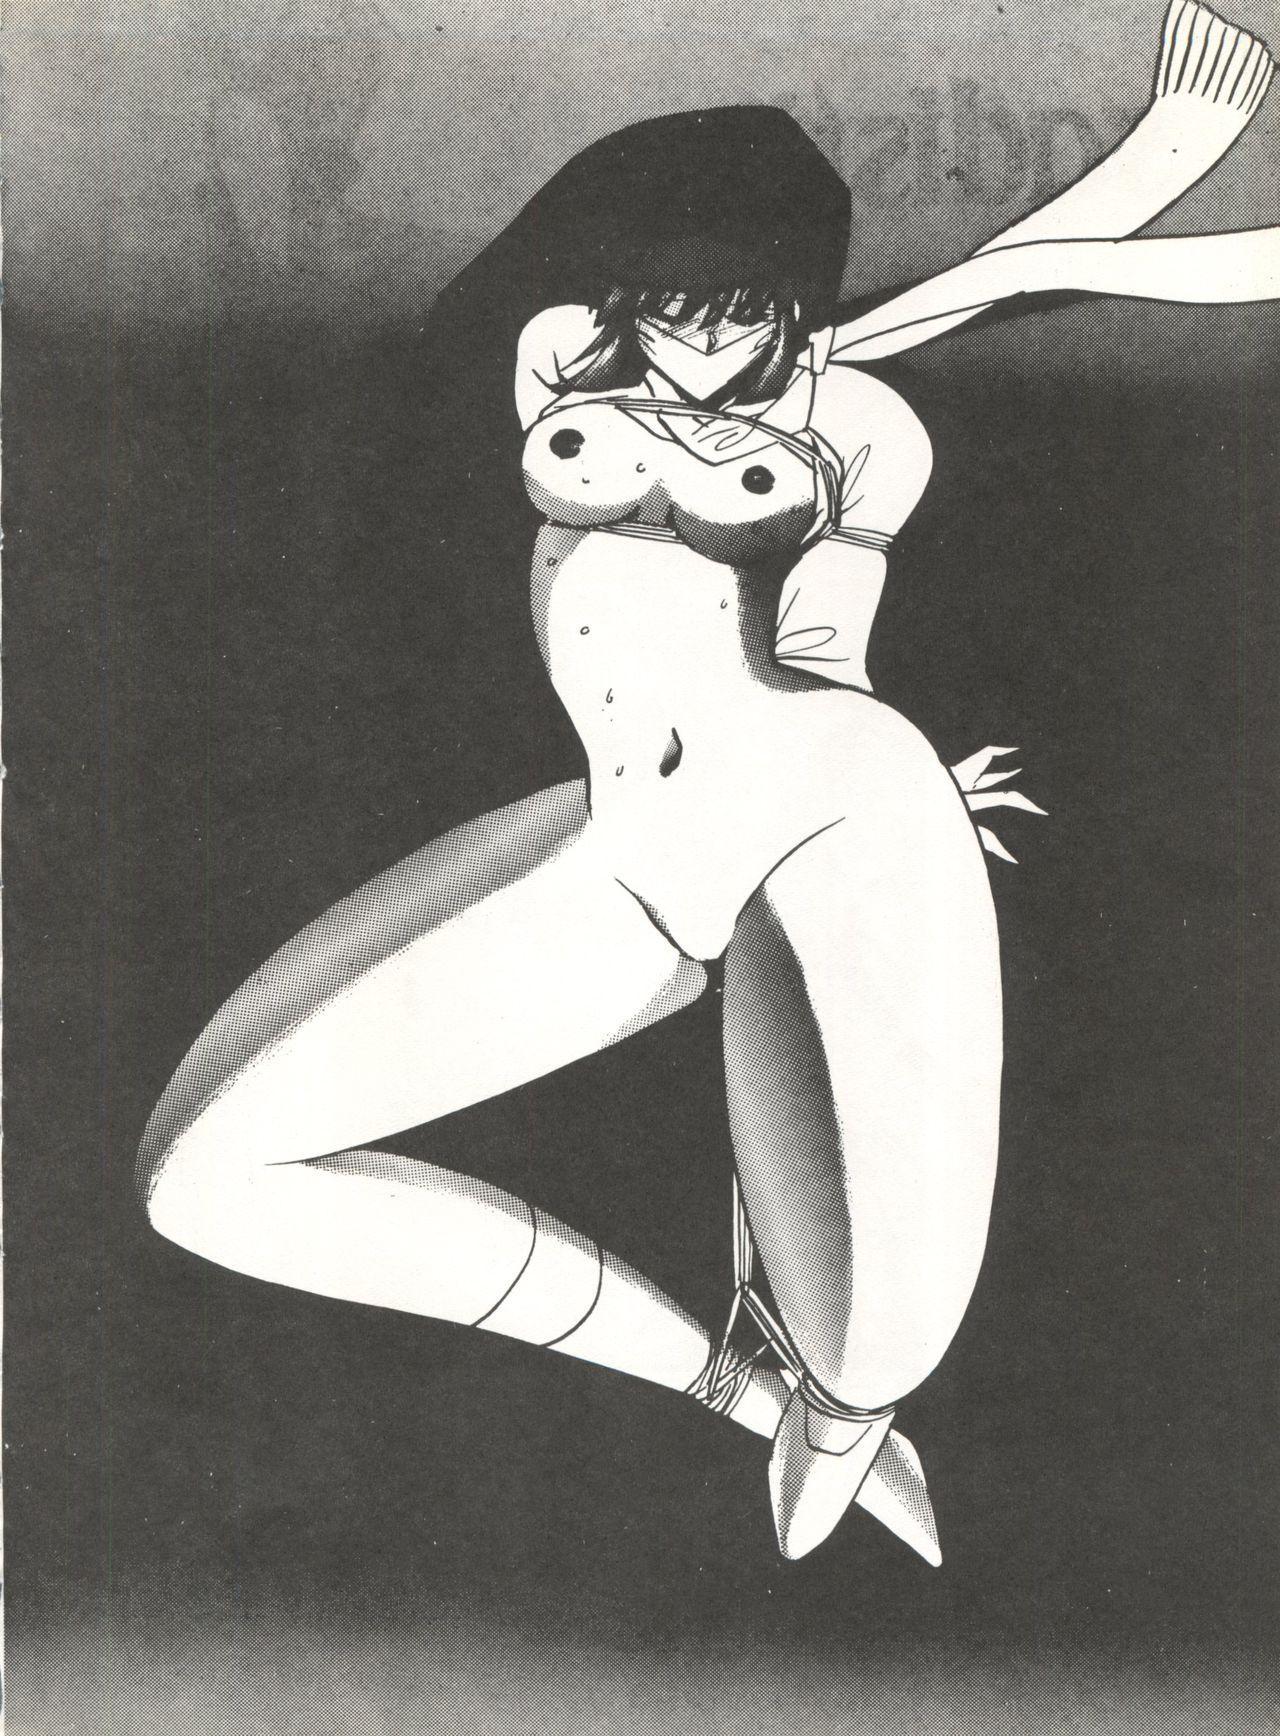 [Global One (MARO)] Sadistic 5 (Cutey Honey, Devilman, Sailor Moon), [Global One (MARO)] Sadistic (Dirty Pair, Fushigi no Umi no Nadia, Sailor Moon), [Studio Ikkatsumajin] .ribbon (Hime-chan's Ribbon) 3